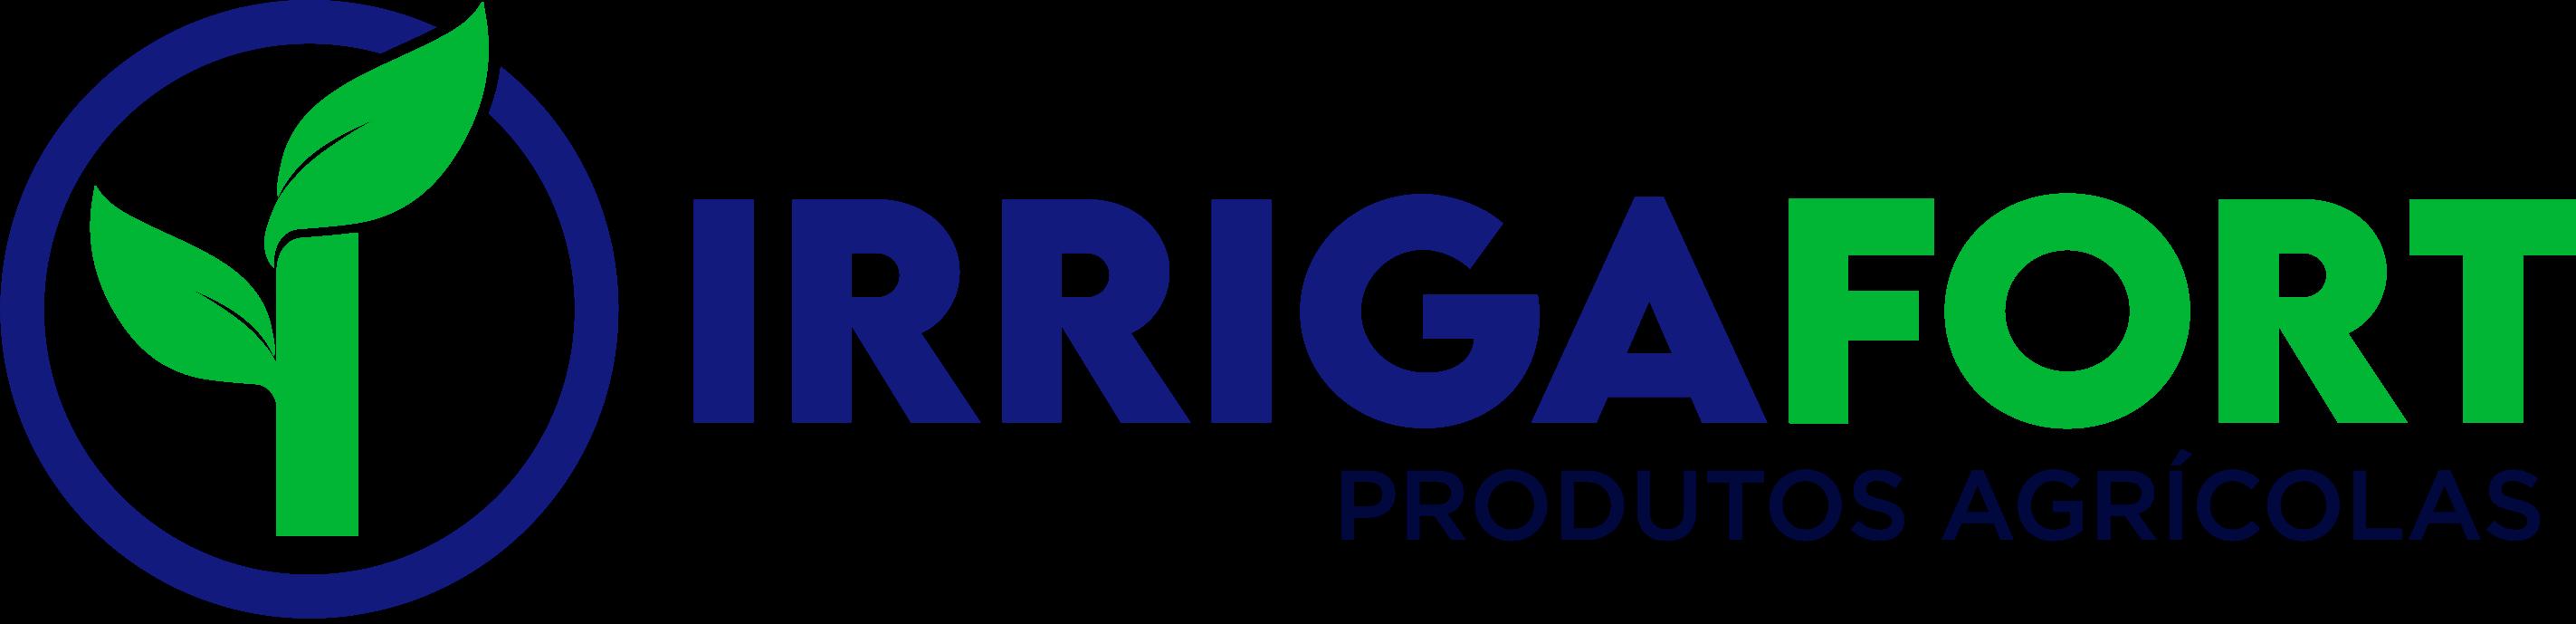 Irrigafort - Produtos Agrícolas